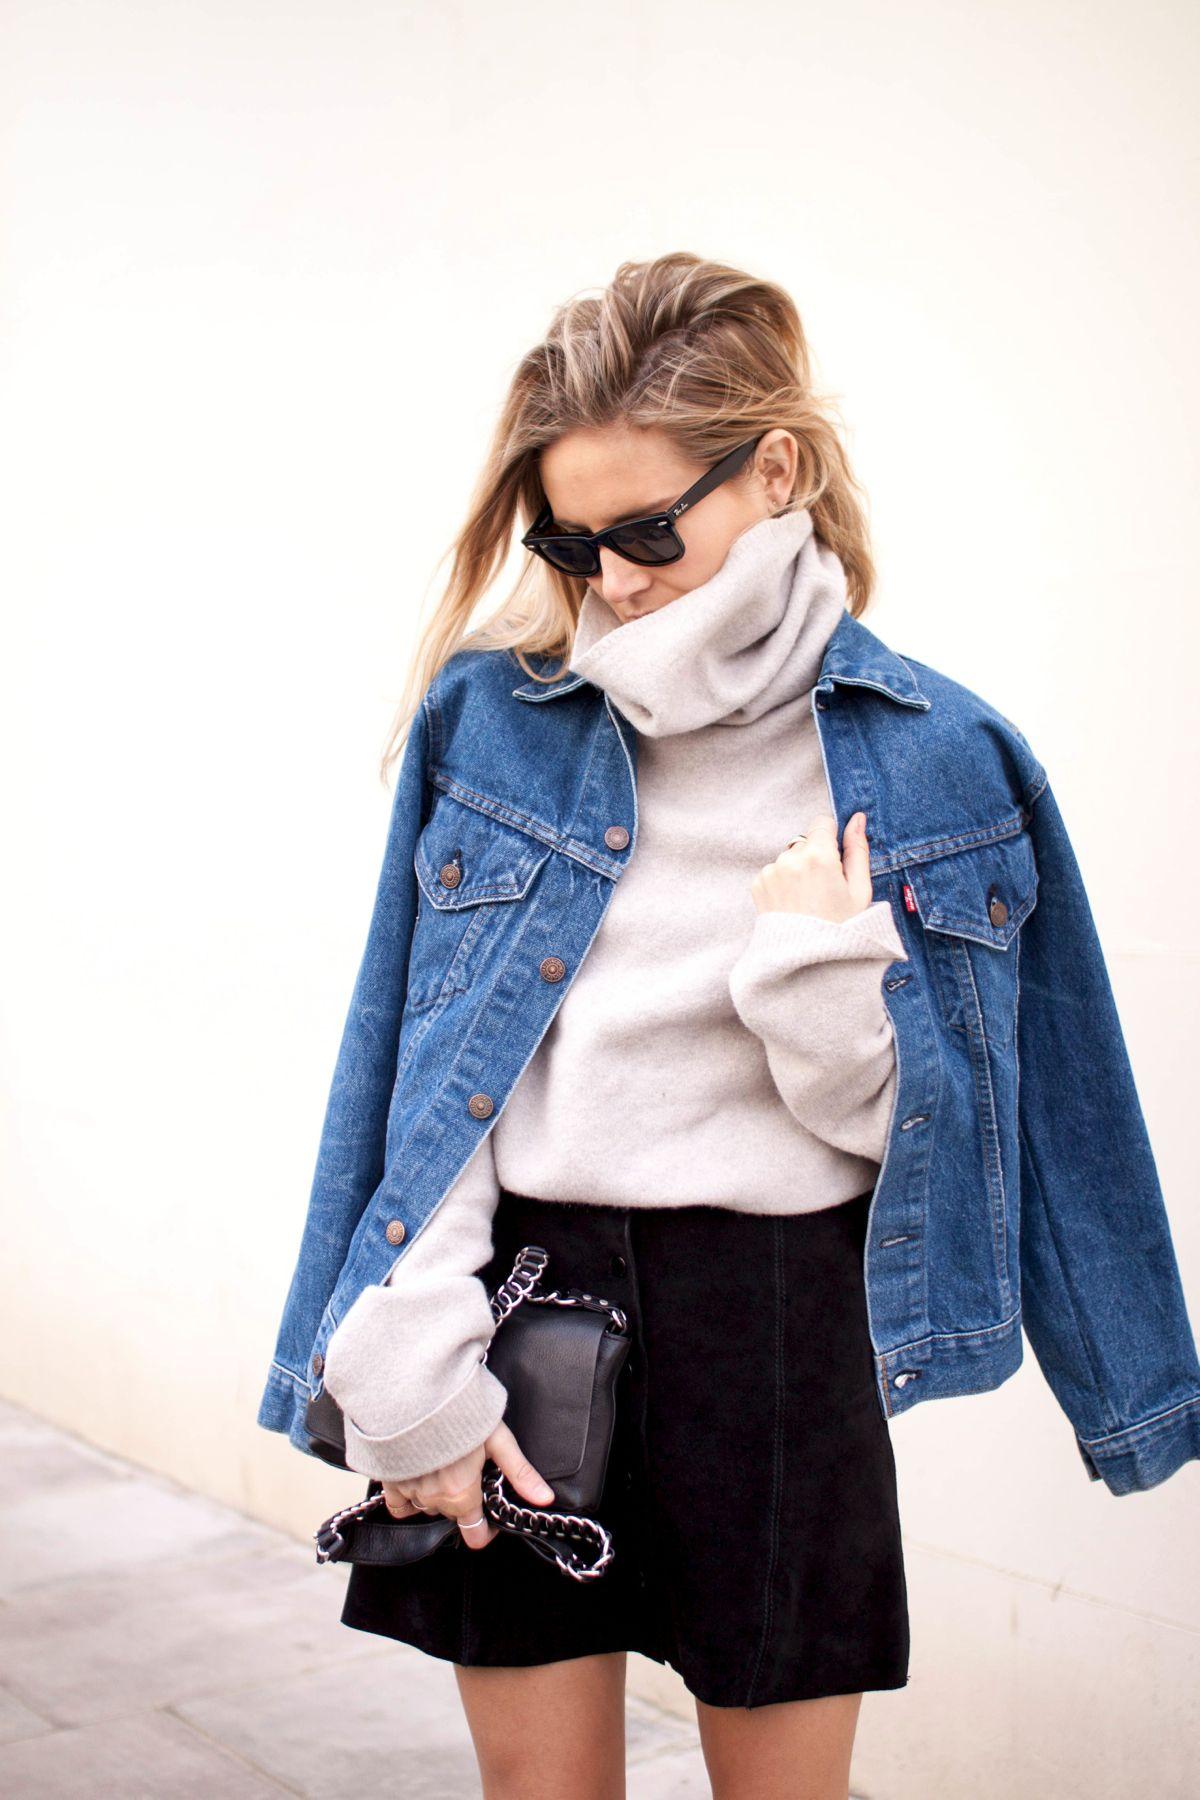 7 Unbelievably Chic Ways To Rock A Turtleneck Fashion